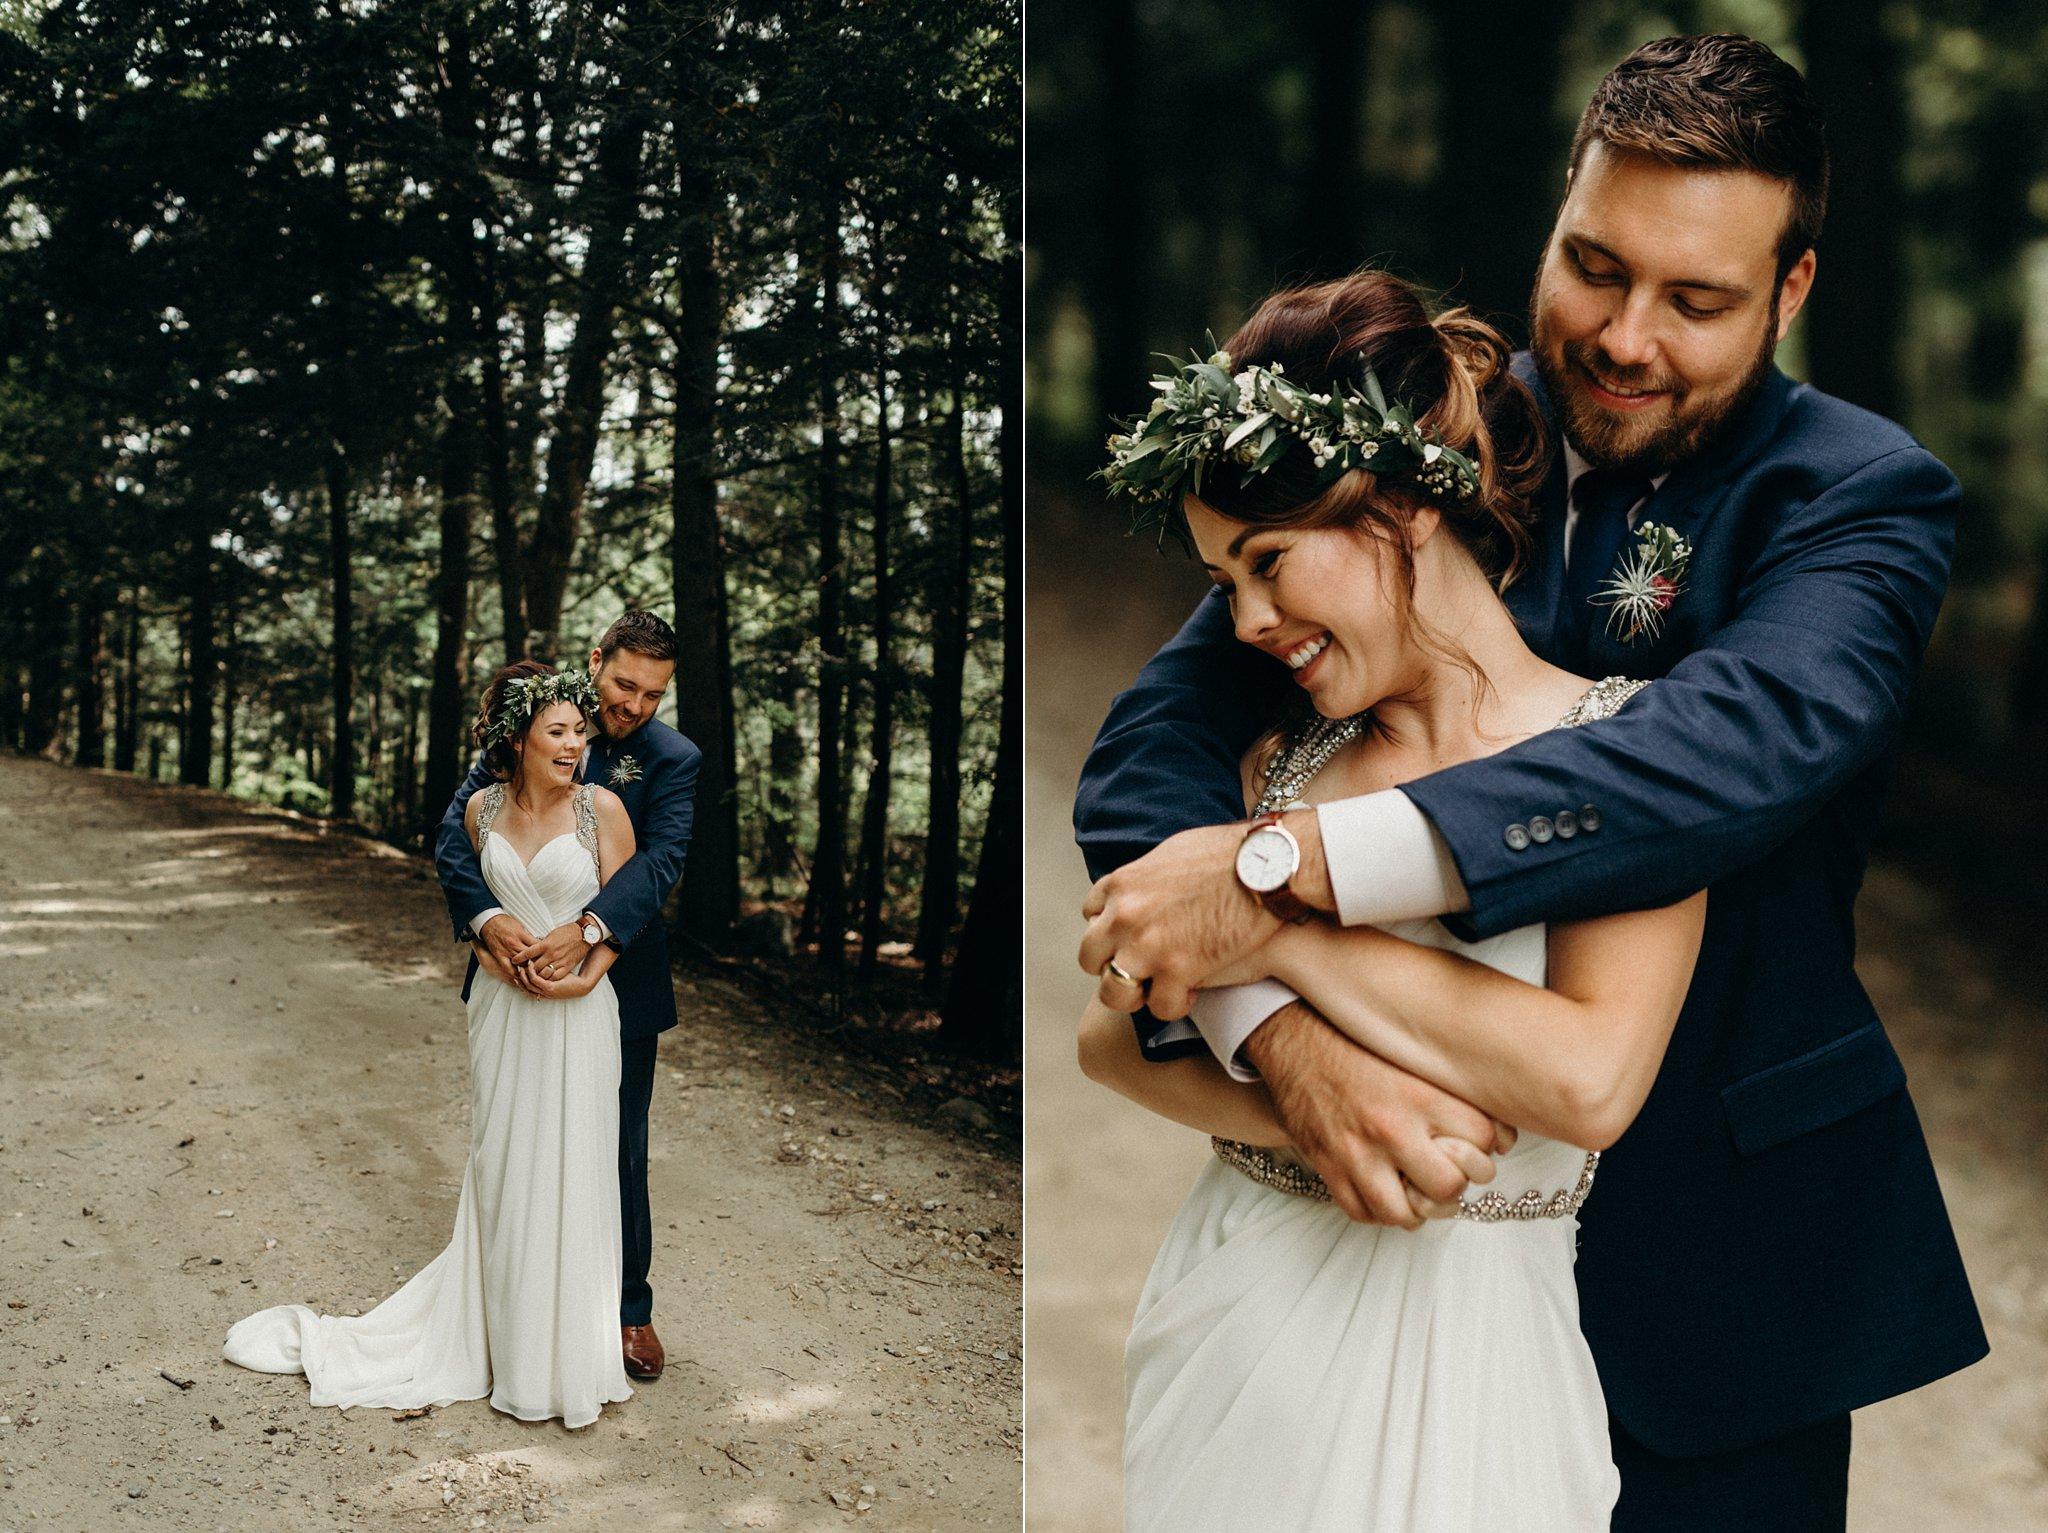 kaihla_tonai_intimate_wedding_elopement_photographer_6580.jpg